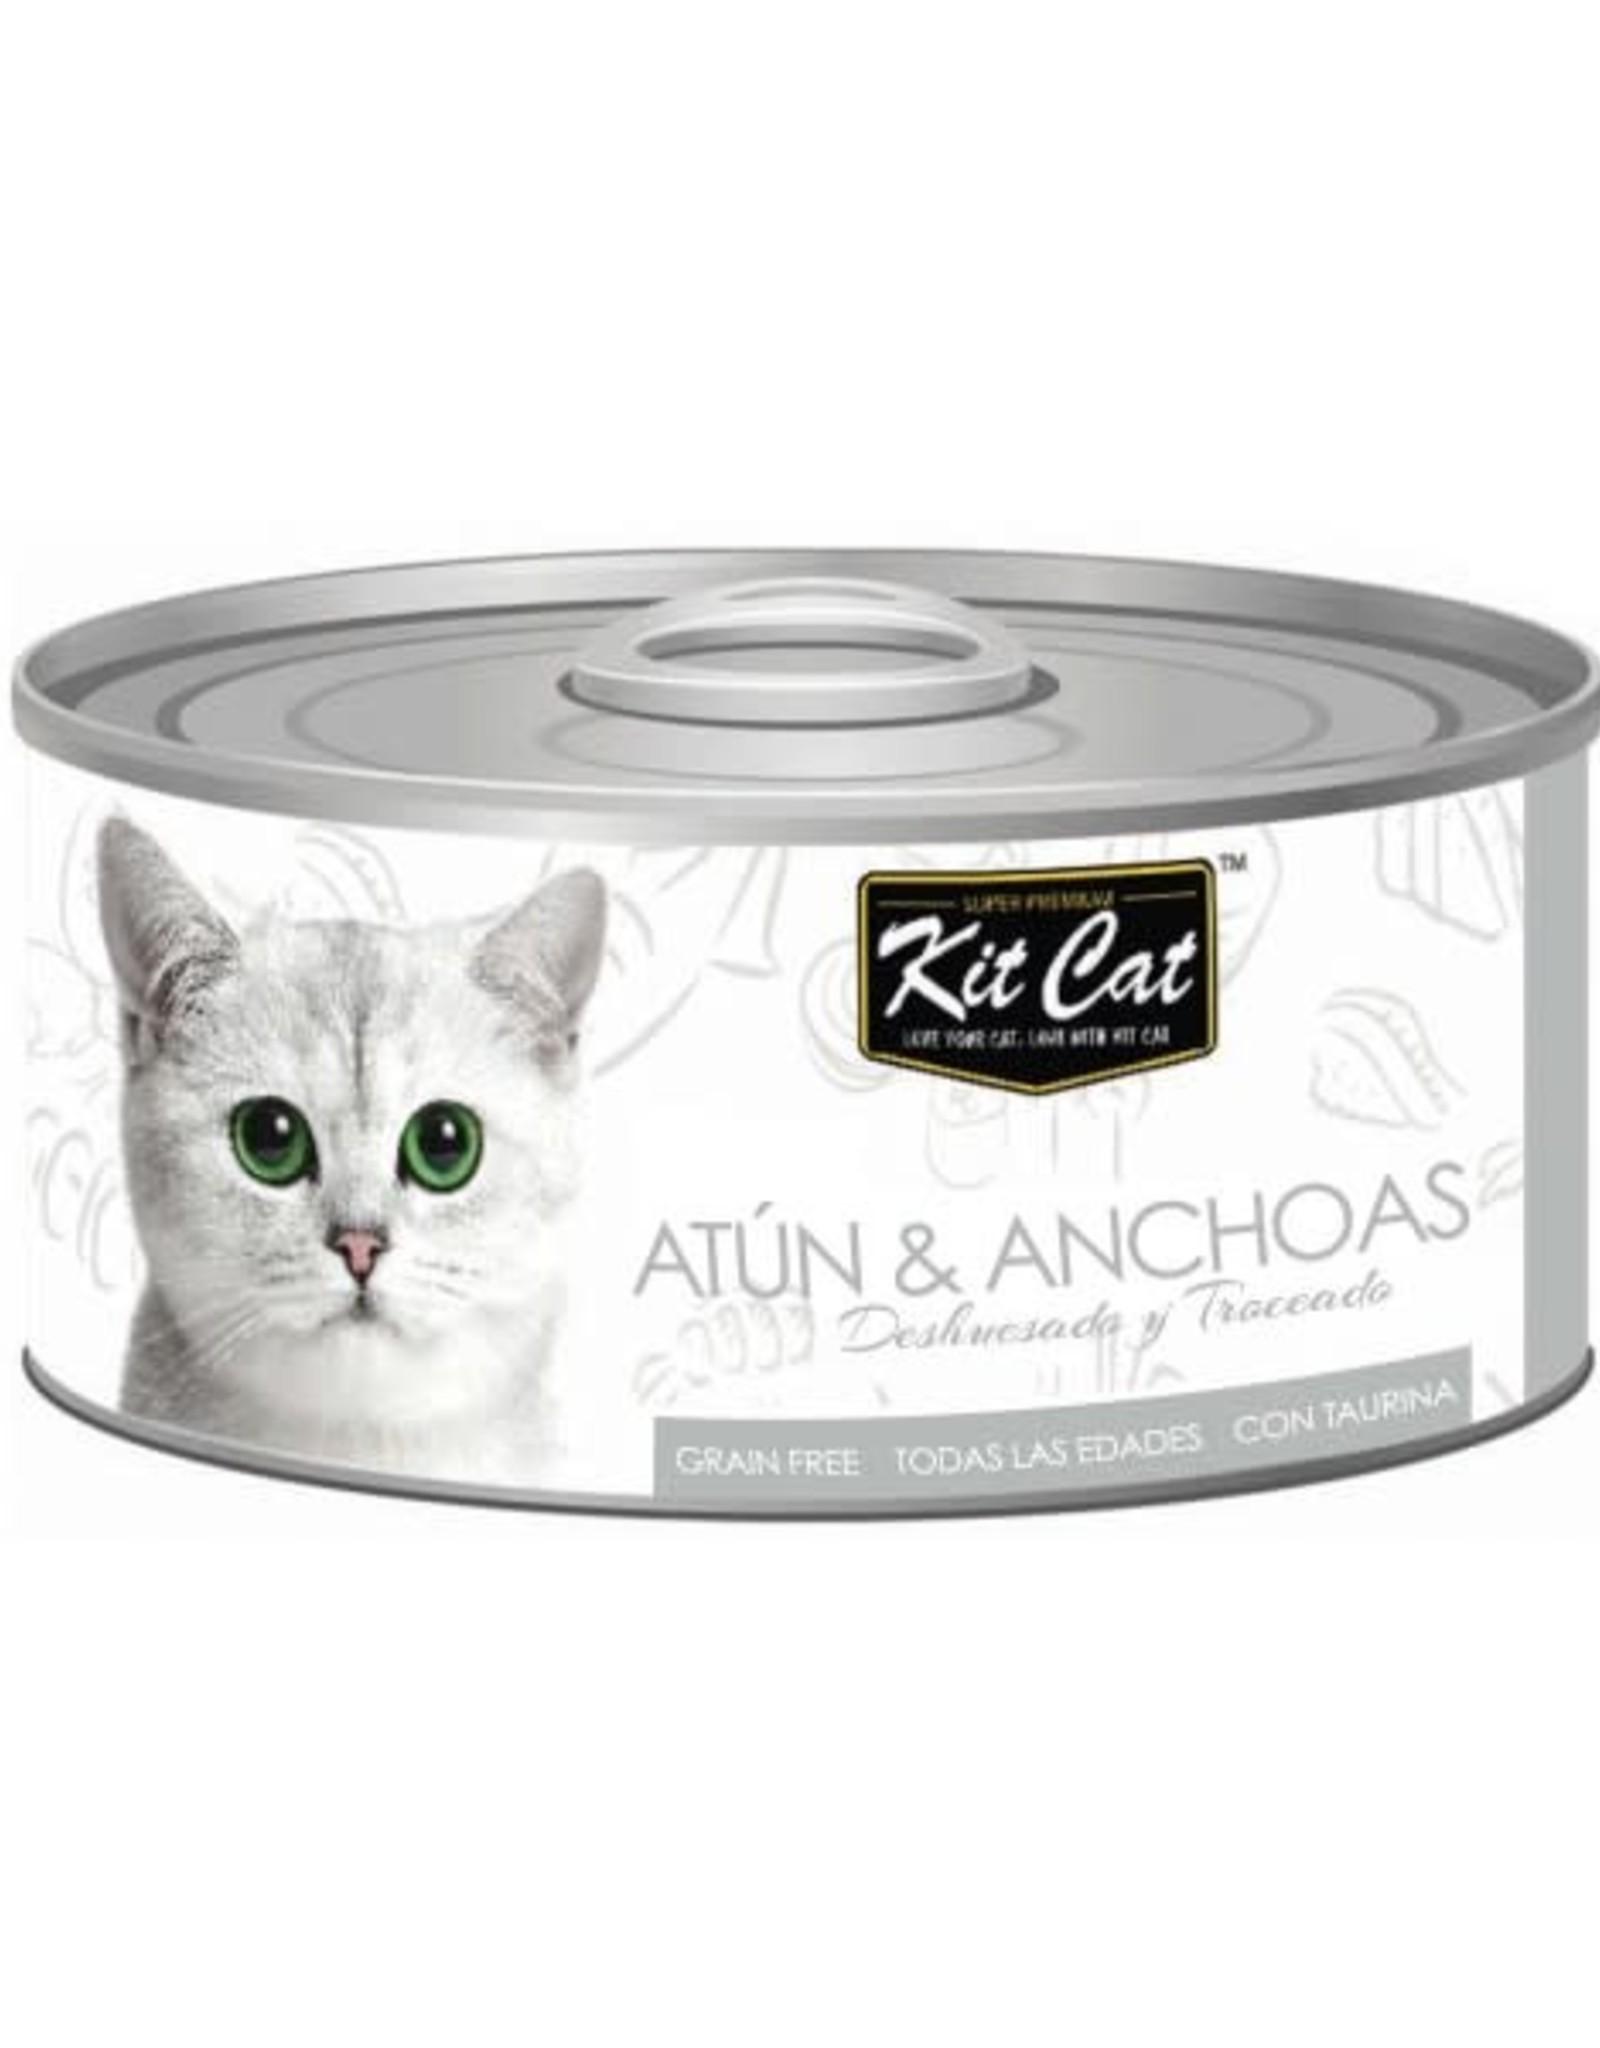 Kit Cat Kit Cat Lata Atun y Anchoas 80 g